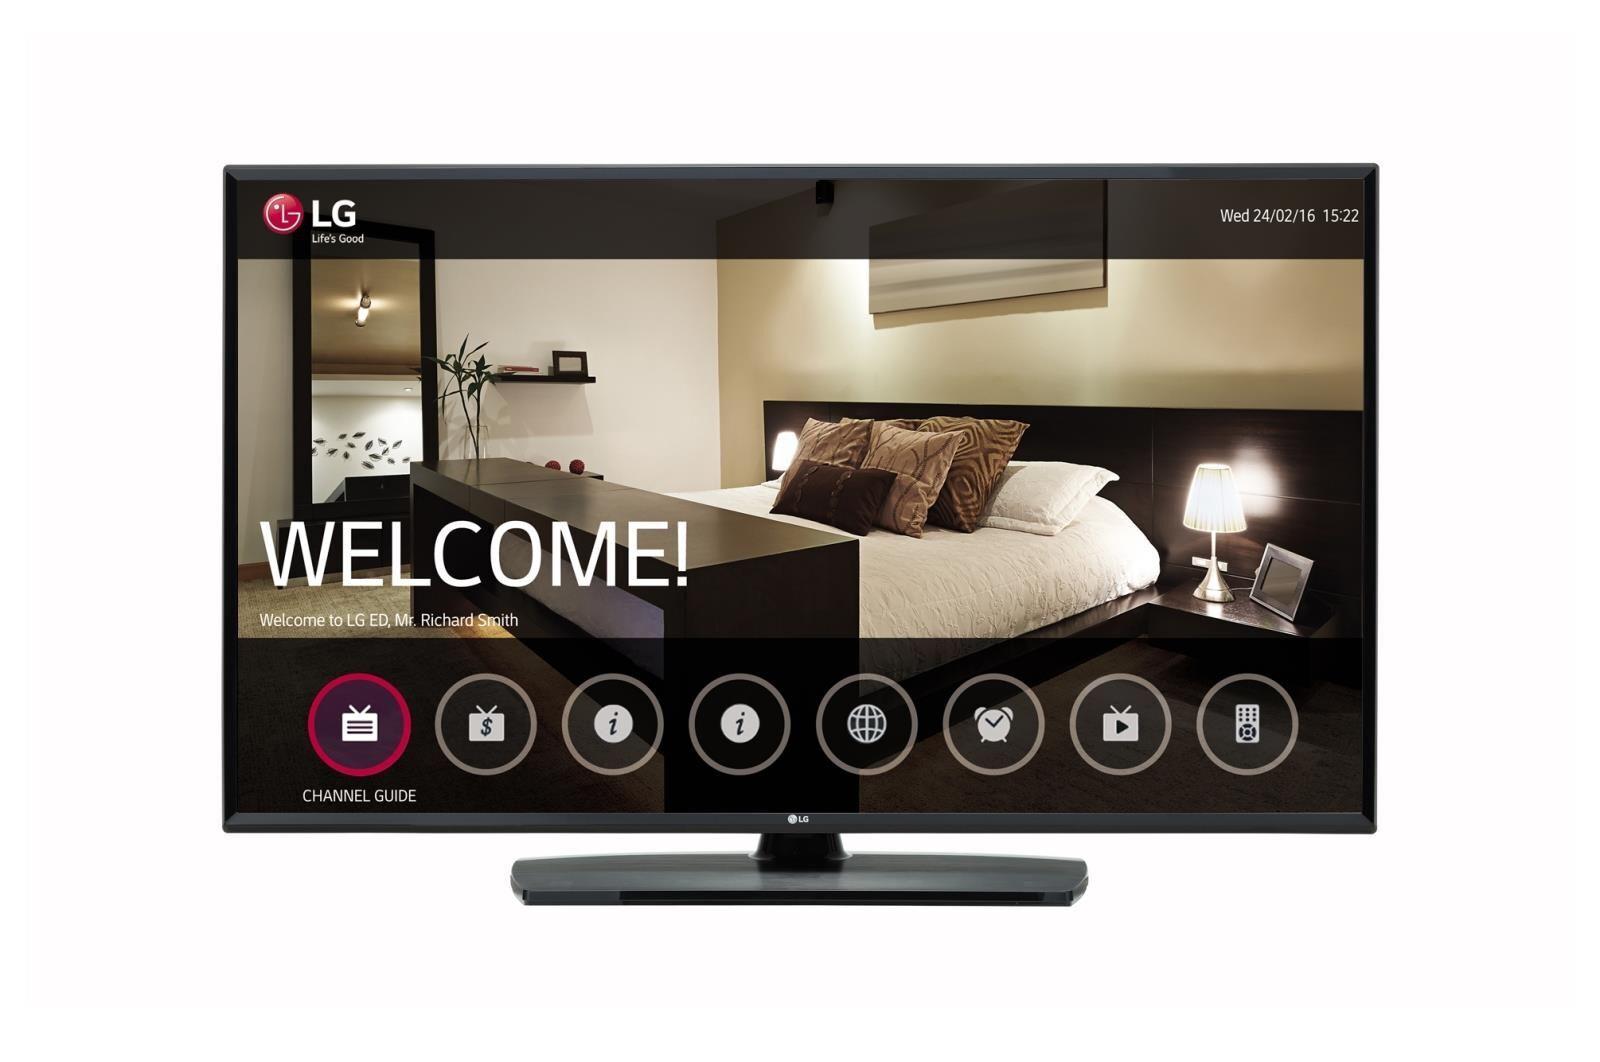 LG 49LU341H Tv Led 49'' Full Hd Hotel Mode Nero